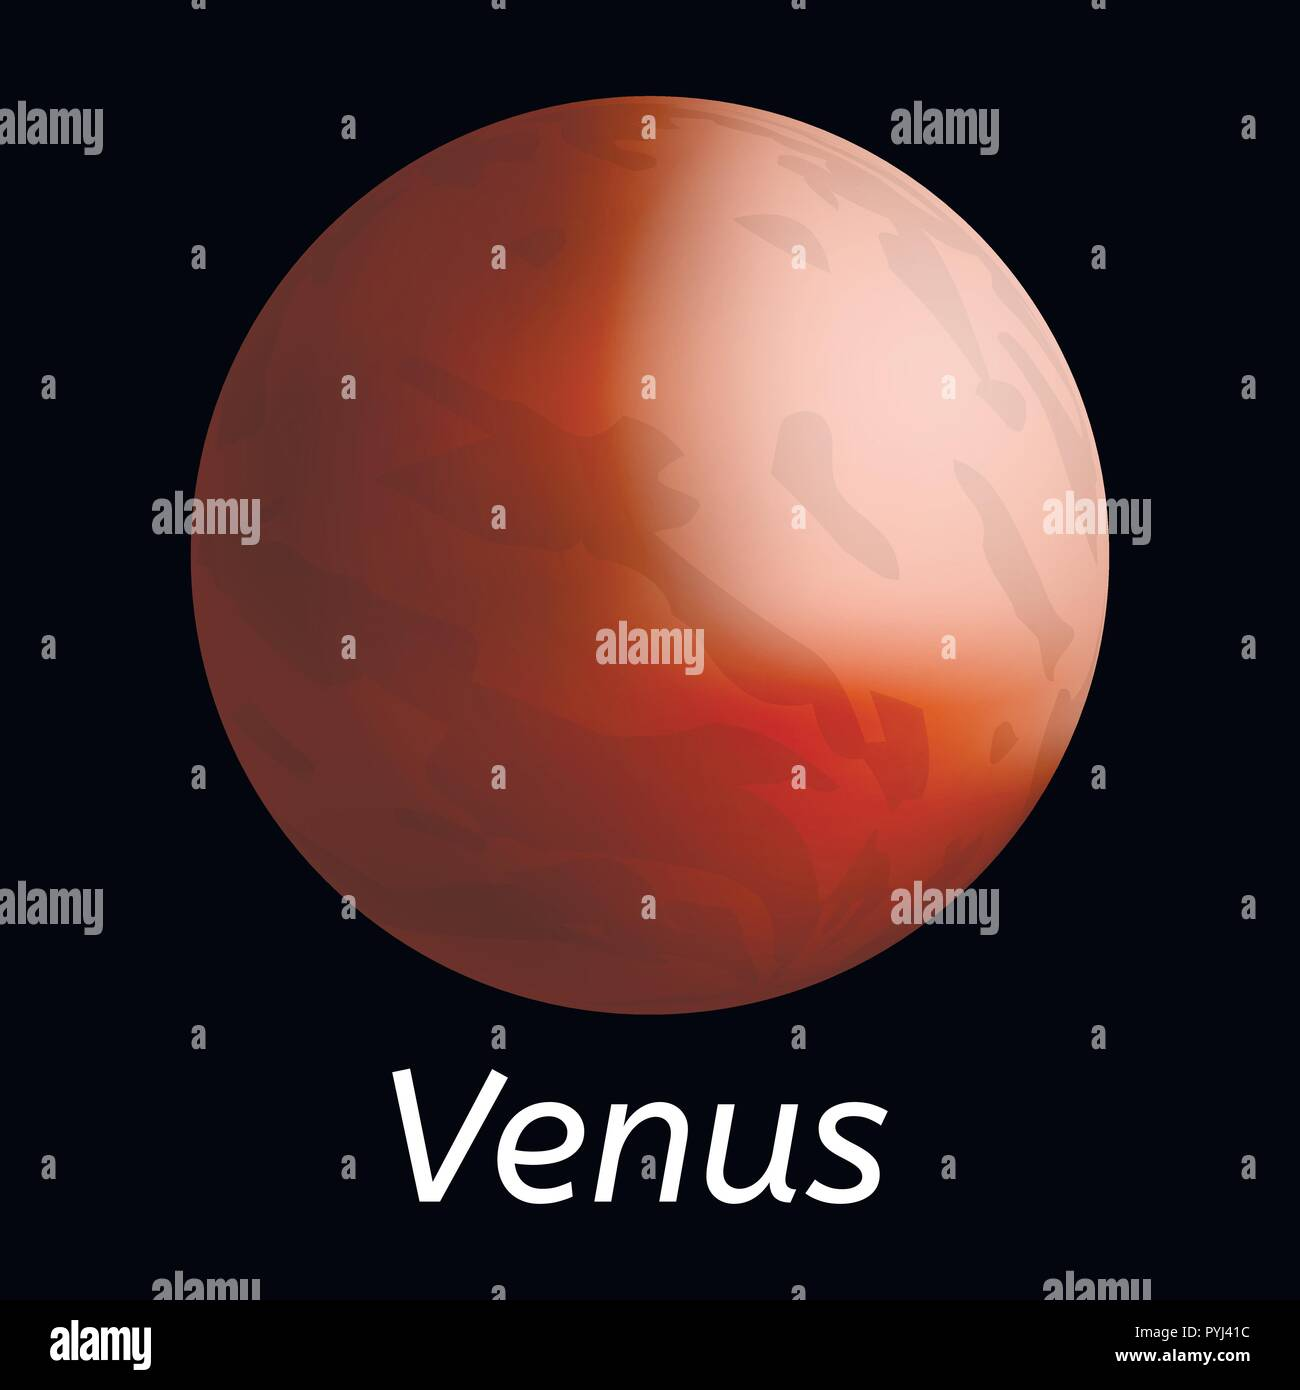 Venus planet icon, realistic style - Stock Image